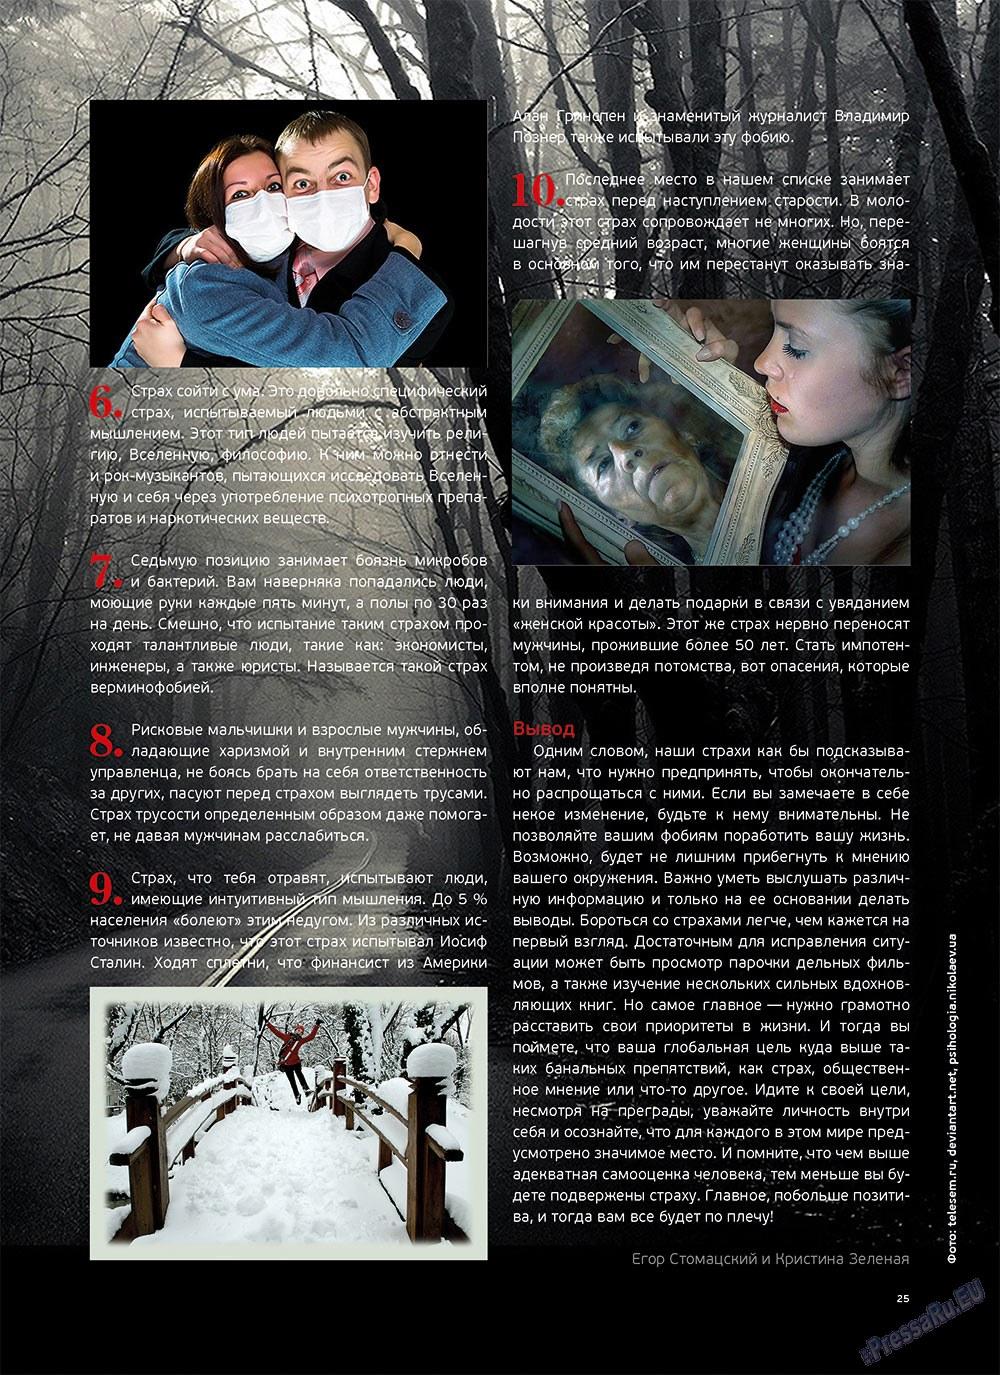 Артек (журнал). 2012 год, номер 5, стр. 27